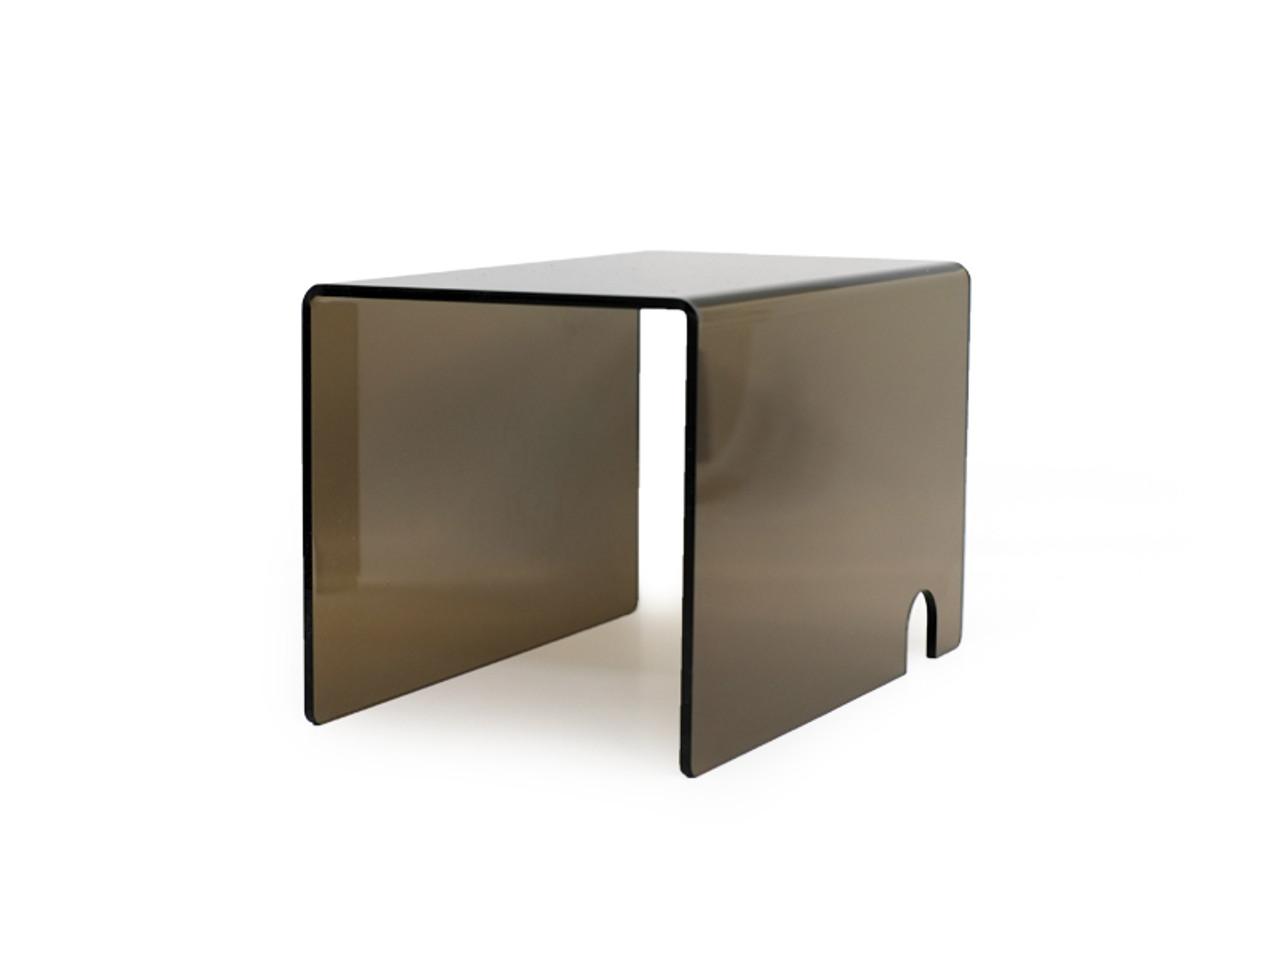 Custom printer stand from OILabel.com